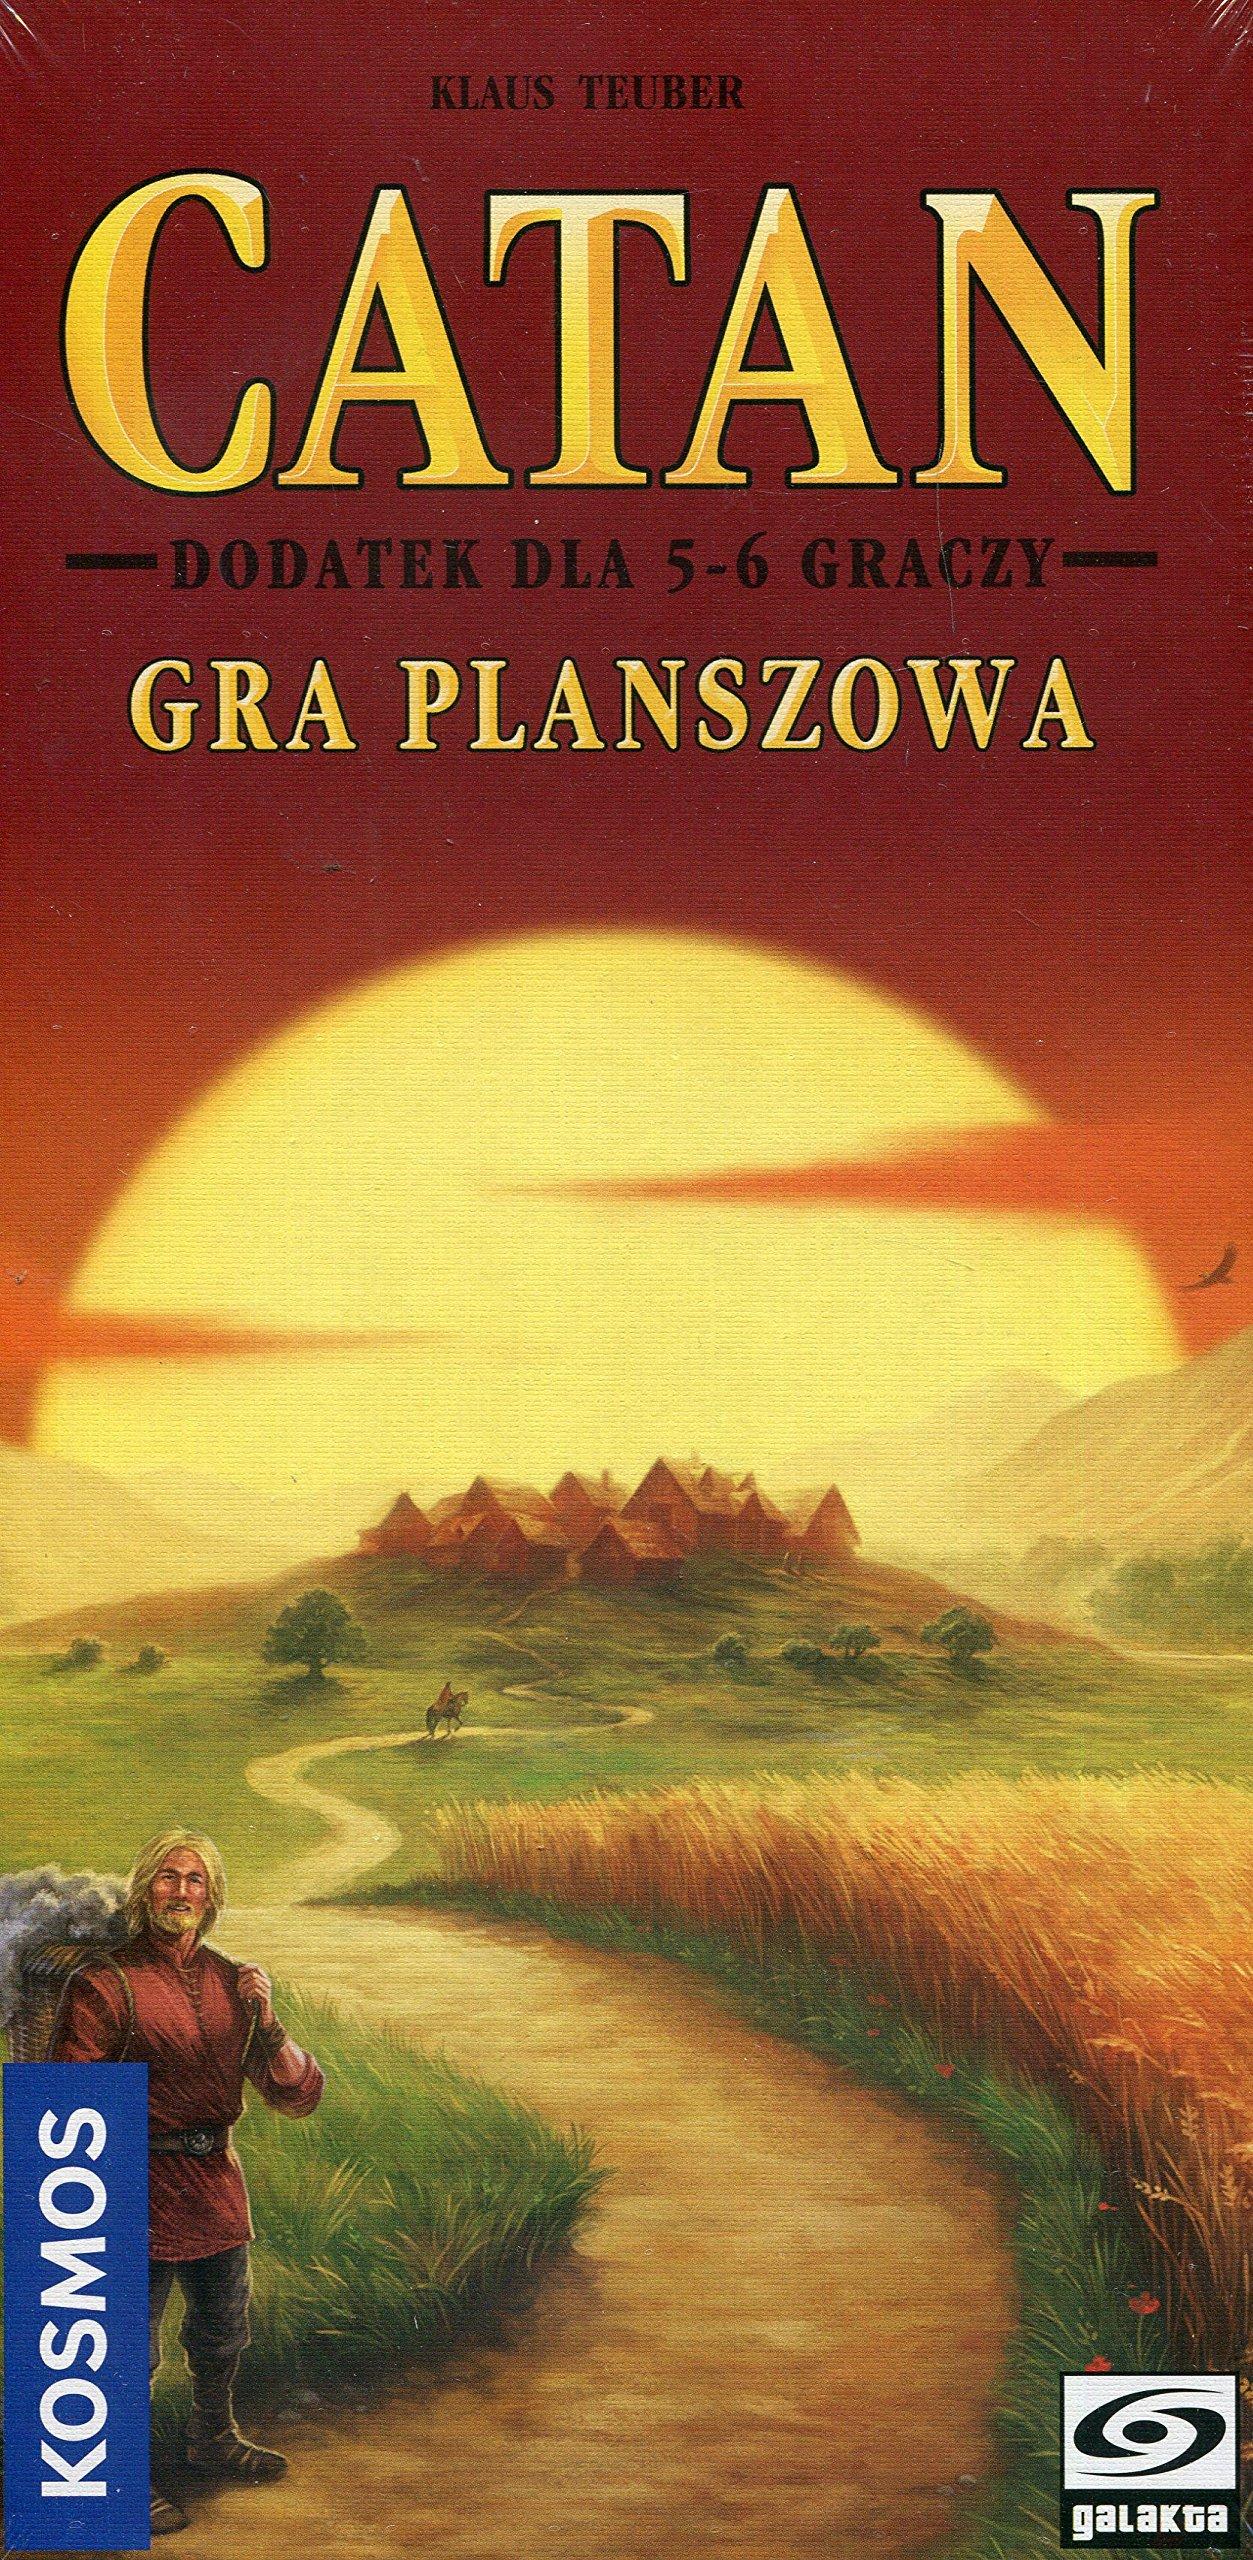 Catan dodatek dla 5-6 graczy: Amazon.es: Teuber, Klaus: Libros en idiomas extranjeros